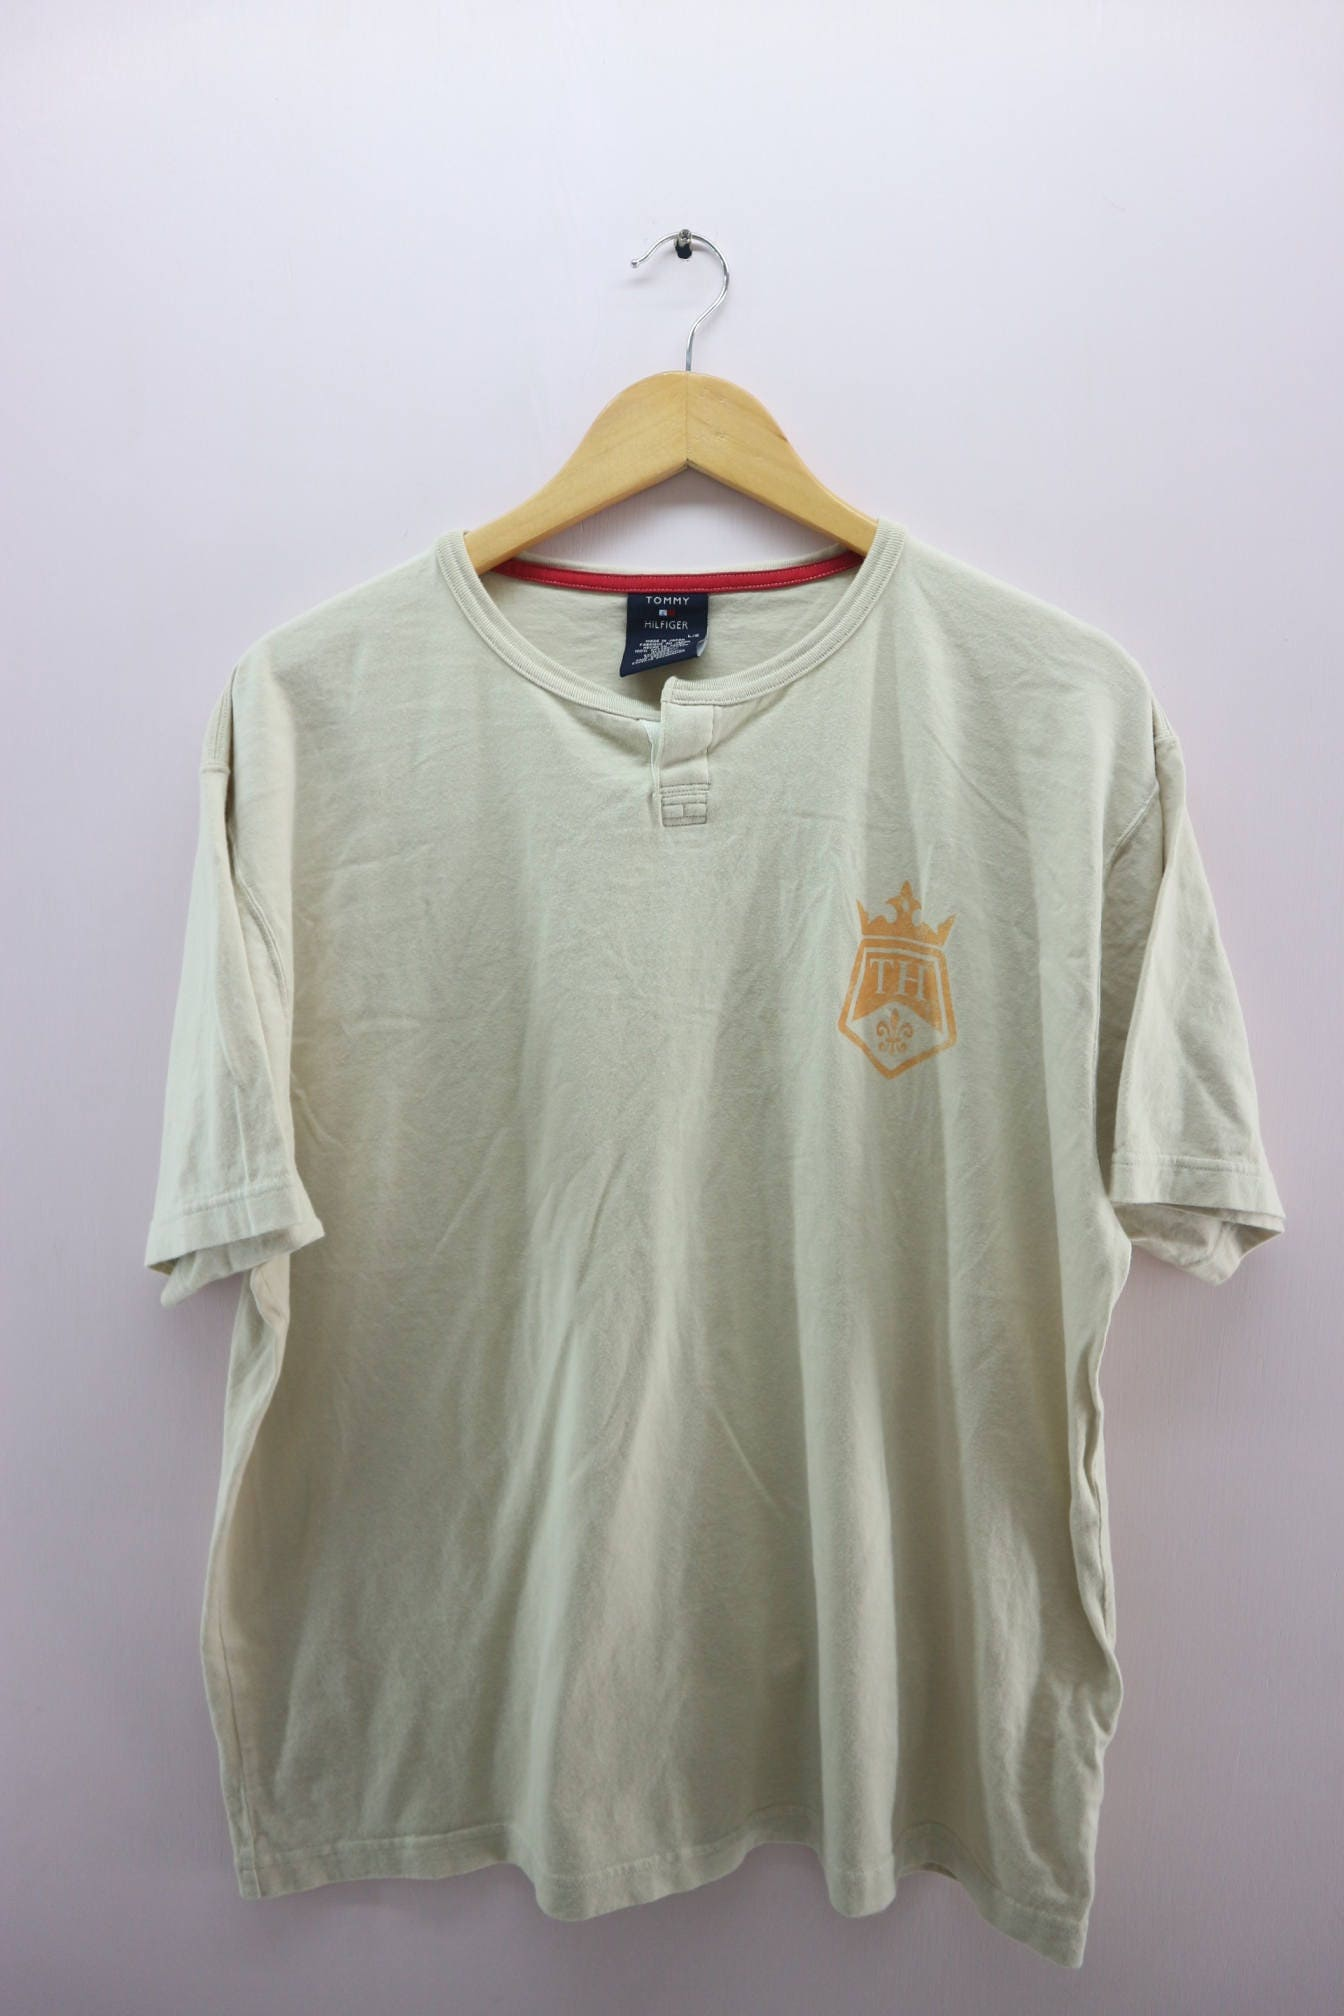 995326e7f Vintage Tommy Hilfiger Shirt Minimalist Logo Designer Street | Etsy